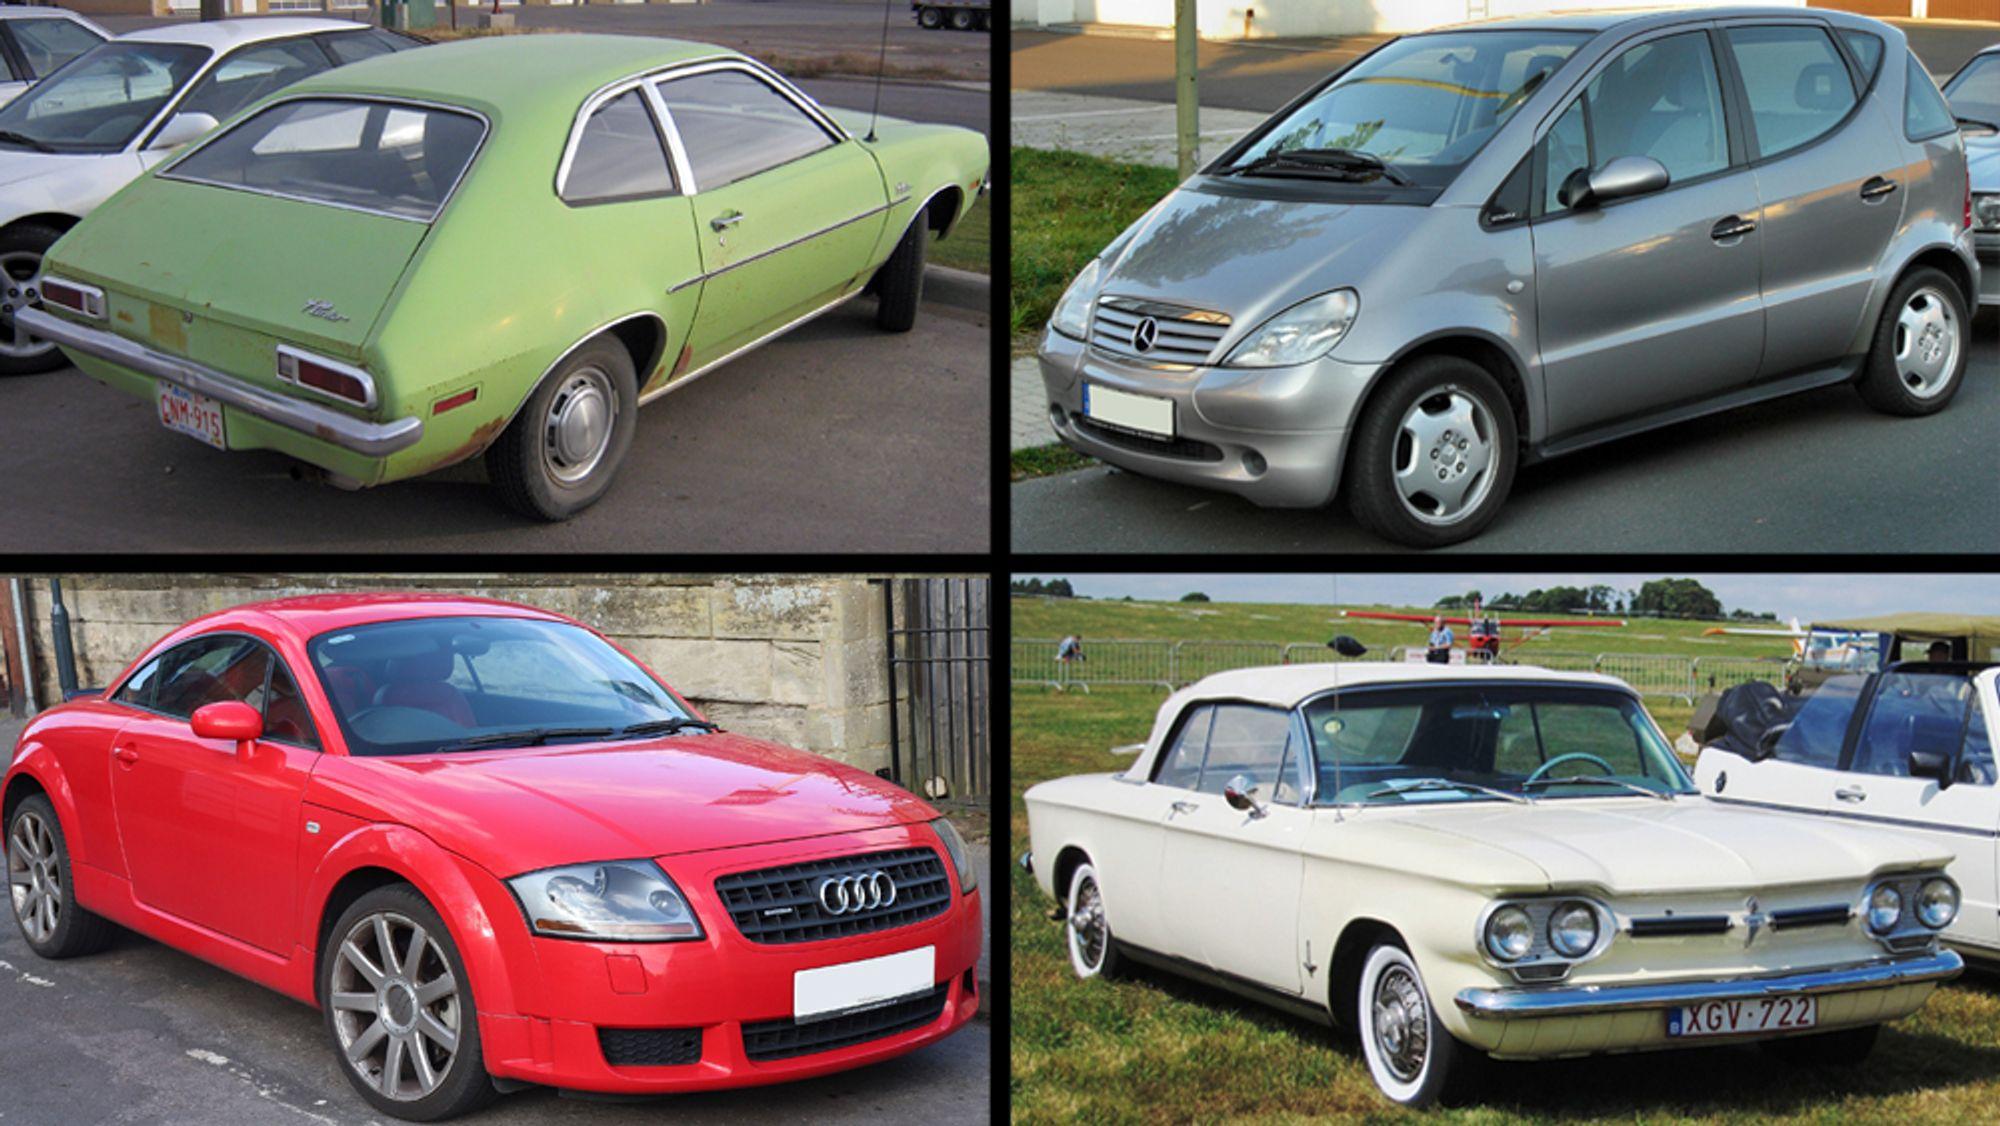 Øverst fra høyre: Ford Pinto, Merchedes A-klasse. Nederst fra venstre: Audi TT, Chevrolet Corvair.